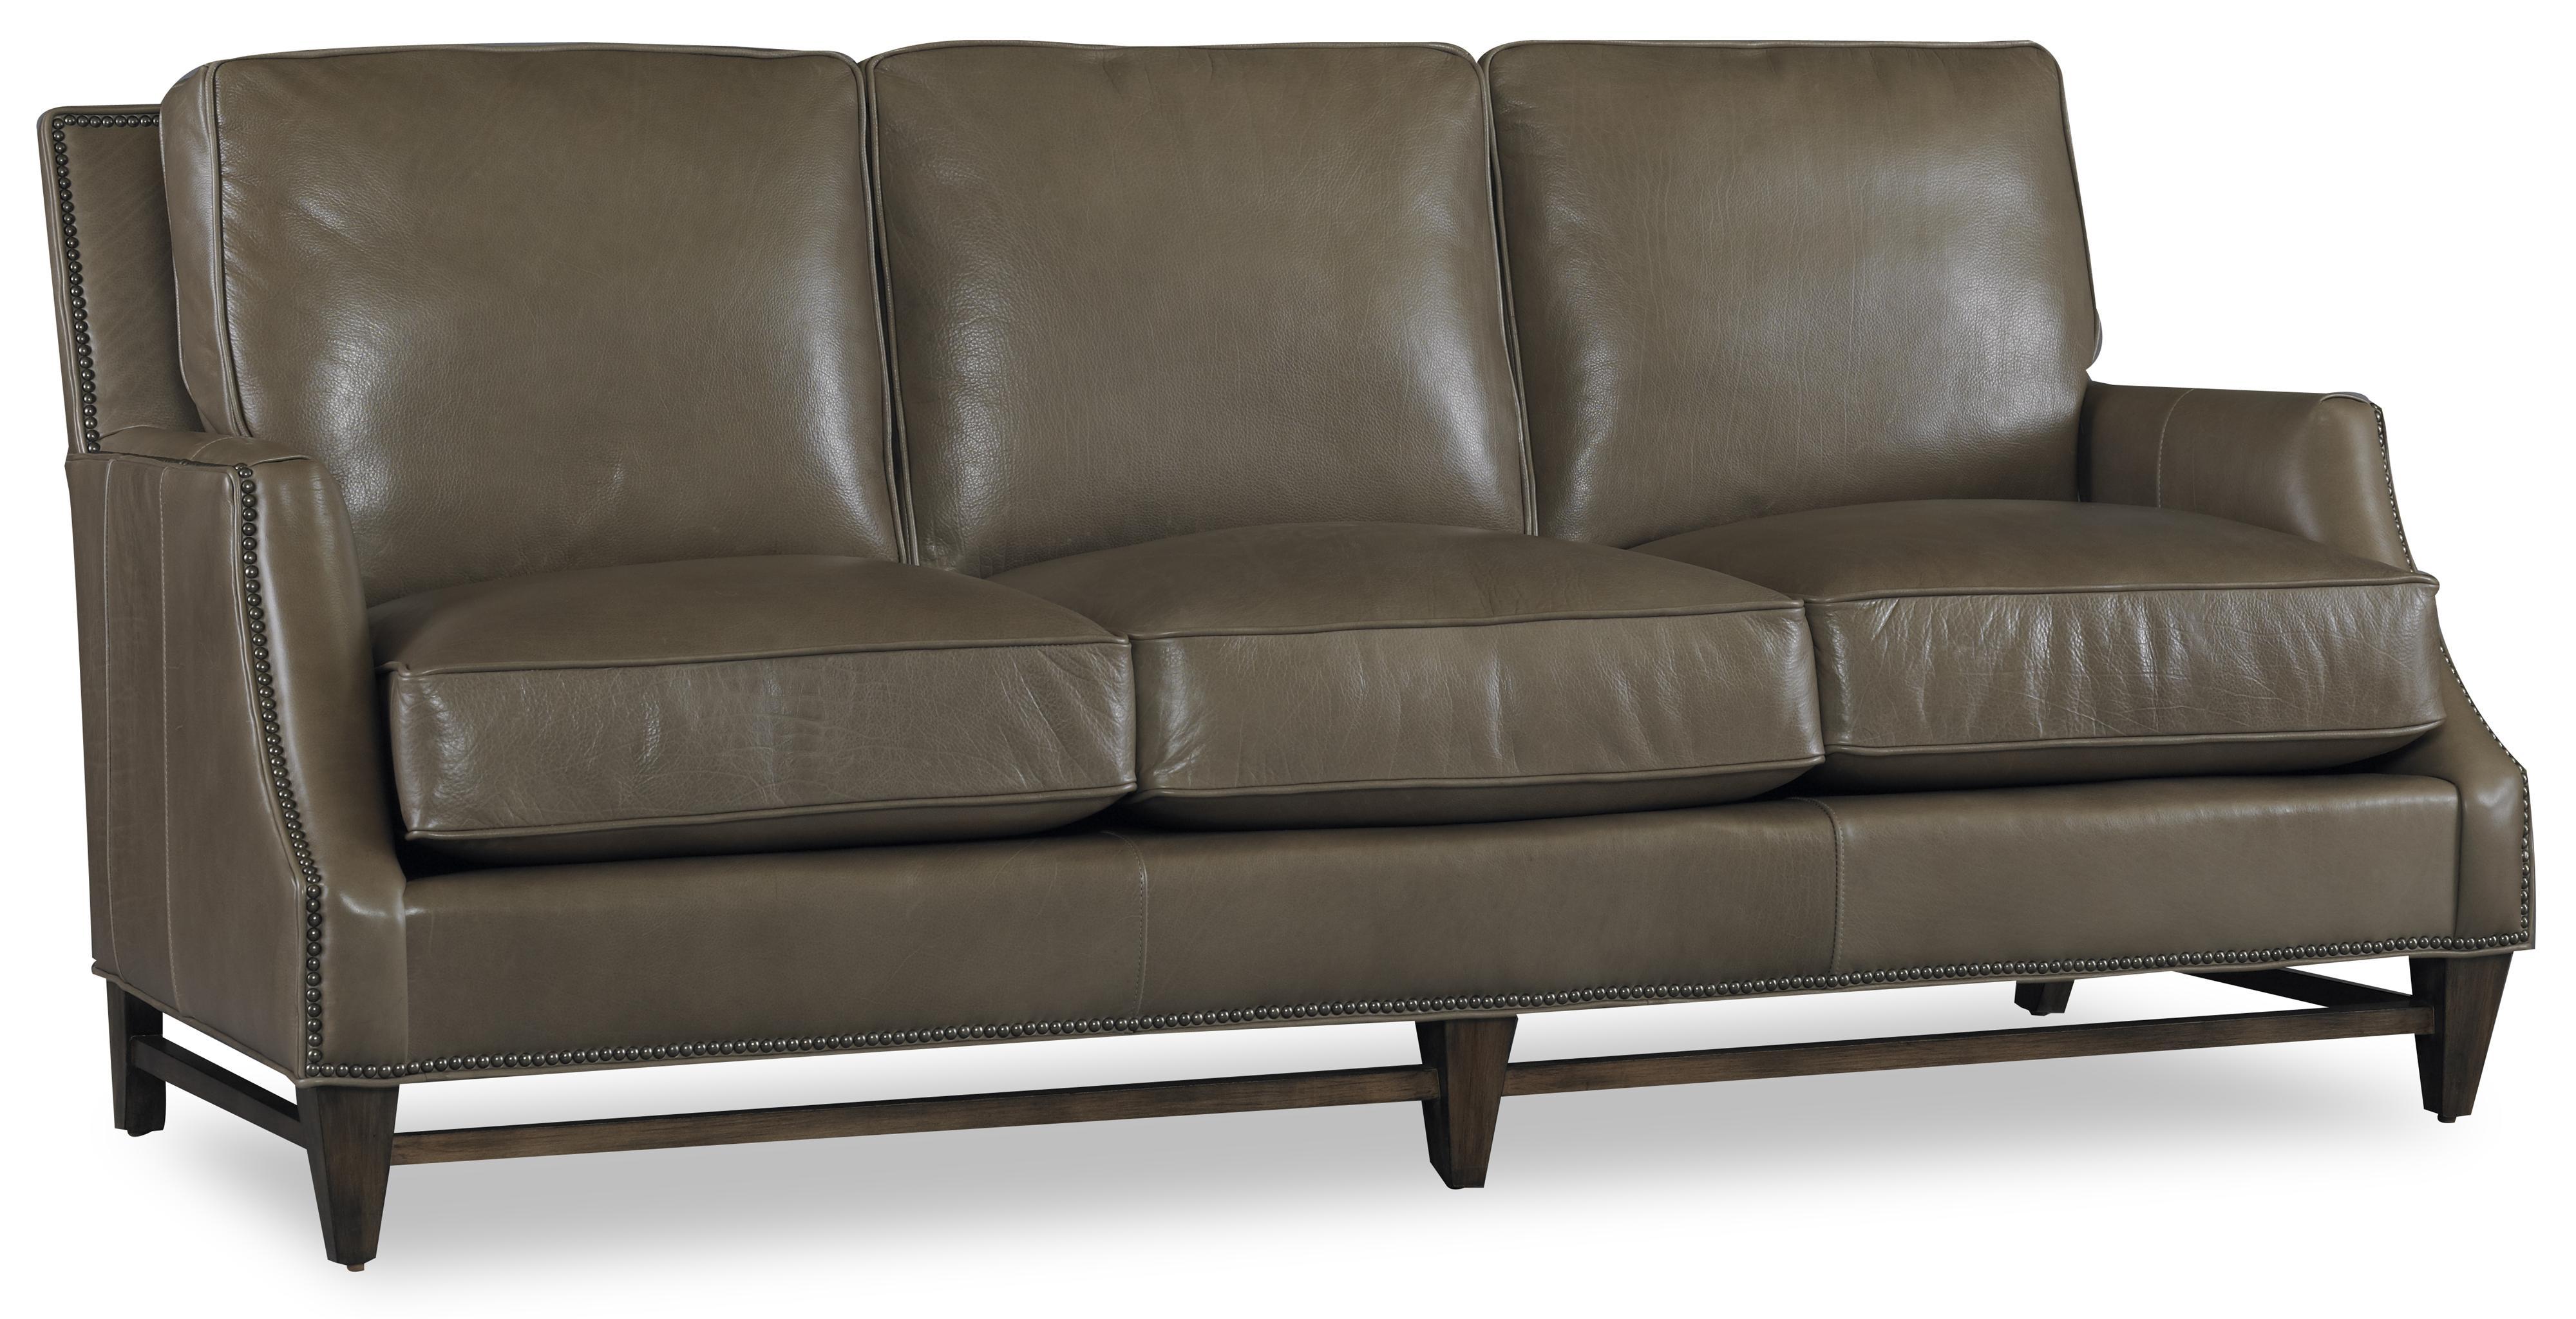 Stationary Seating Madigan Sofa by Bradington Young at Baer's Furniture